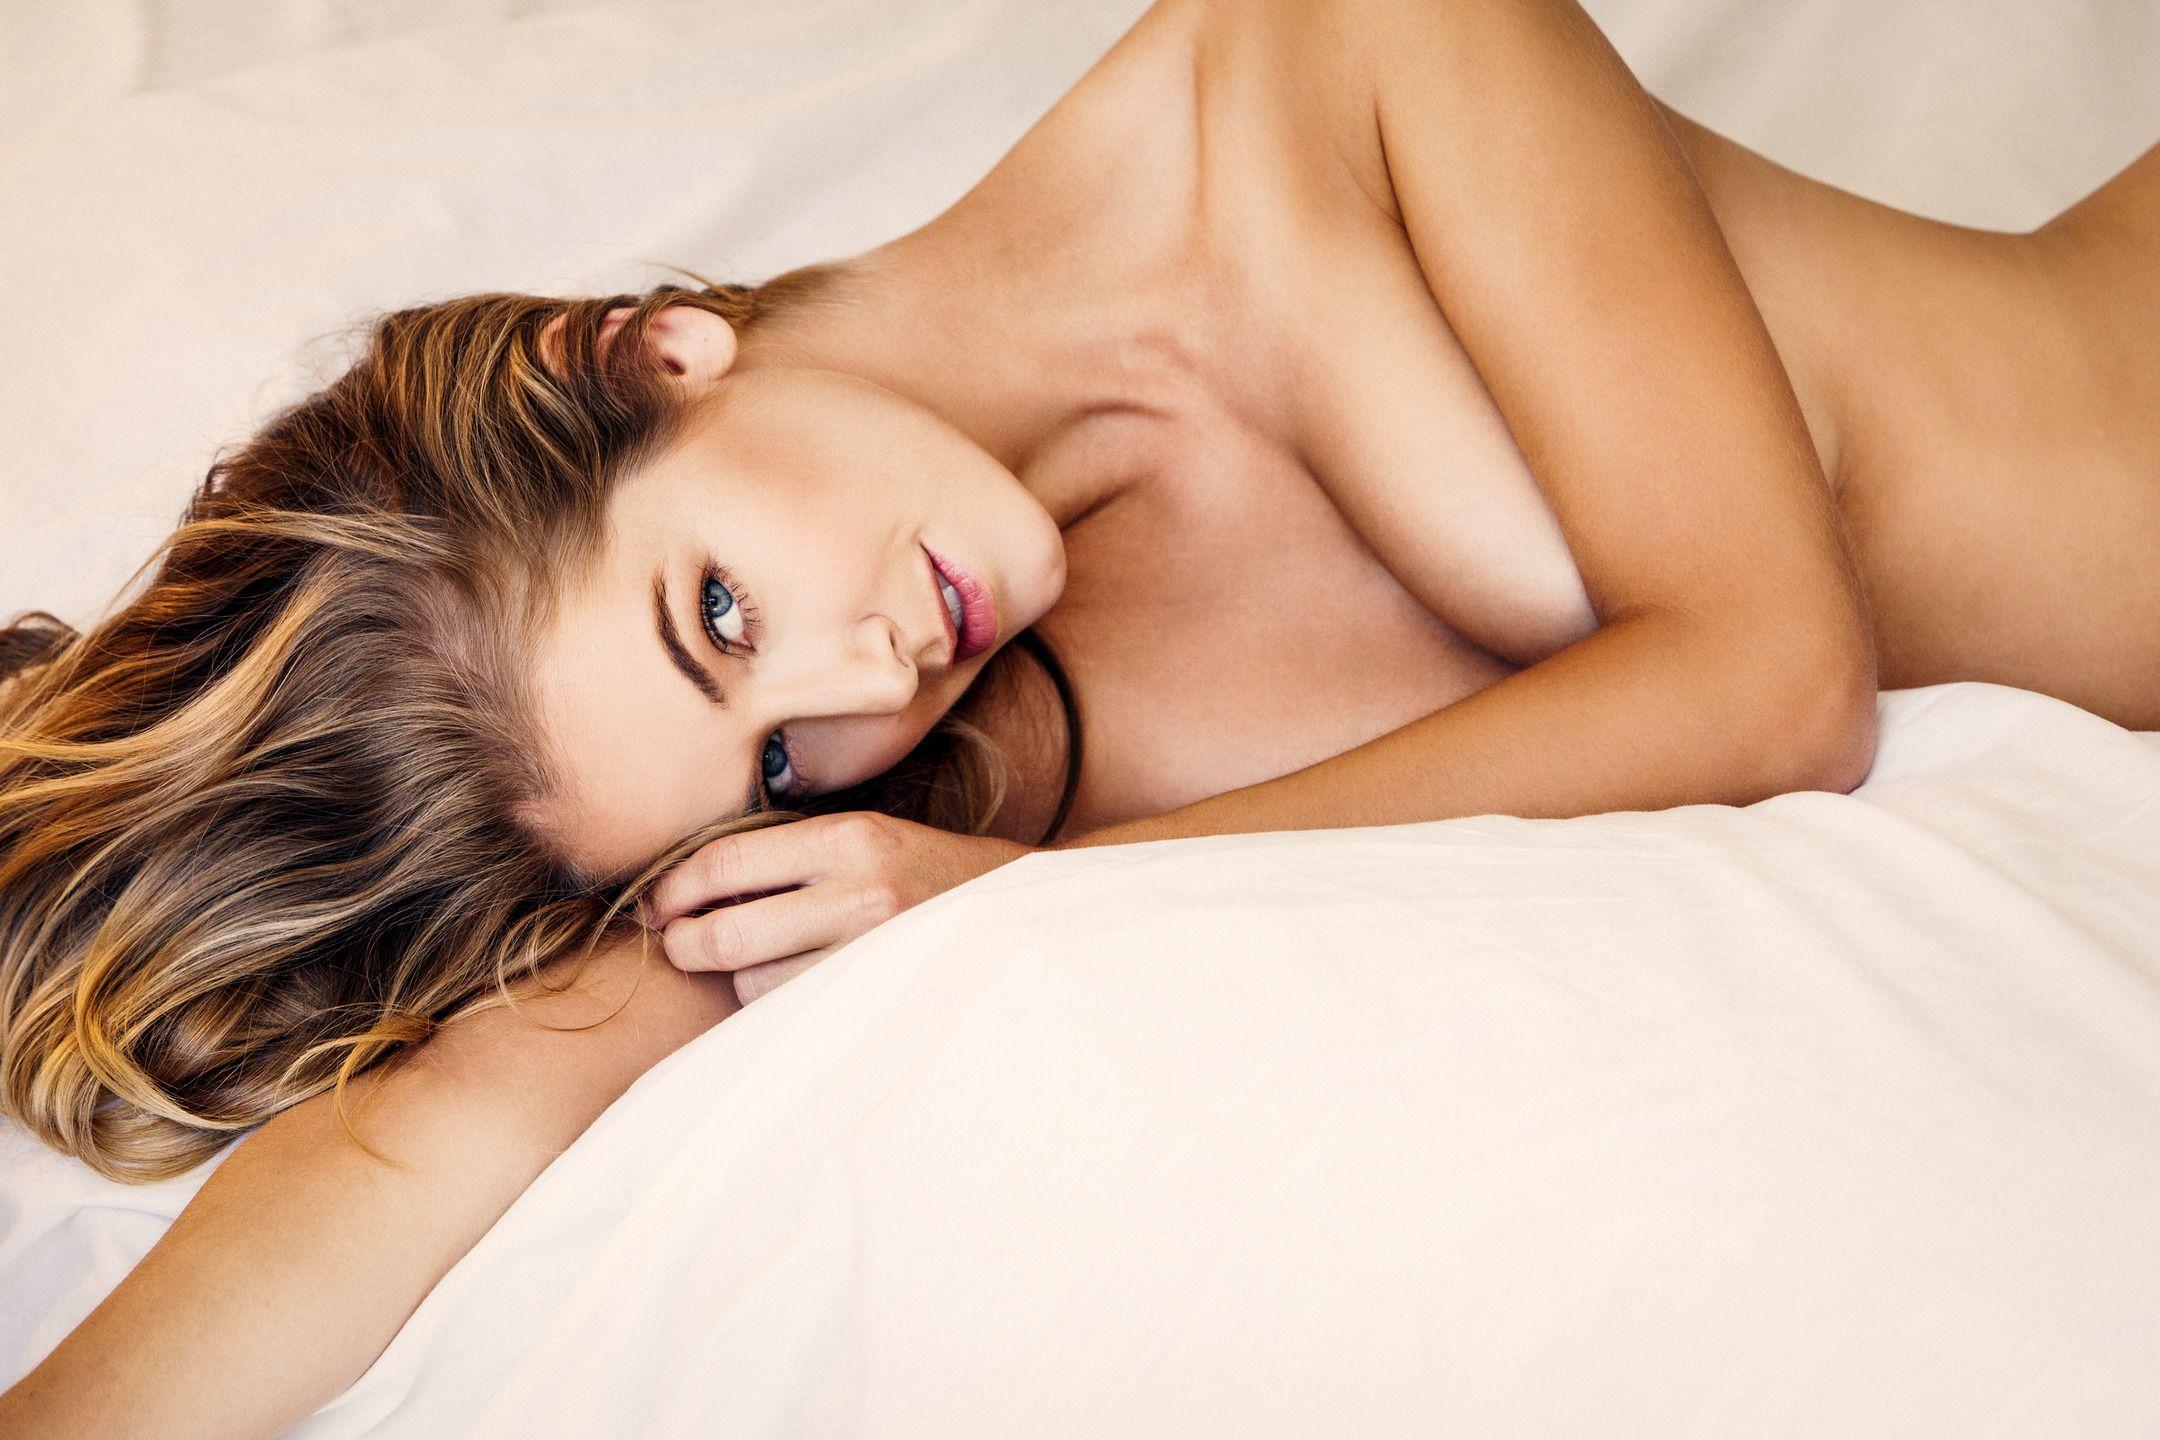 Olivia-Jordan-Topless-1